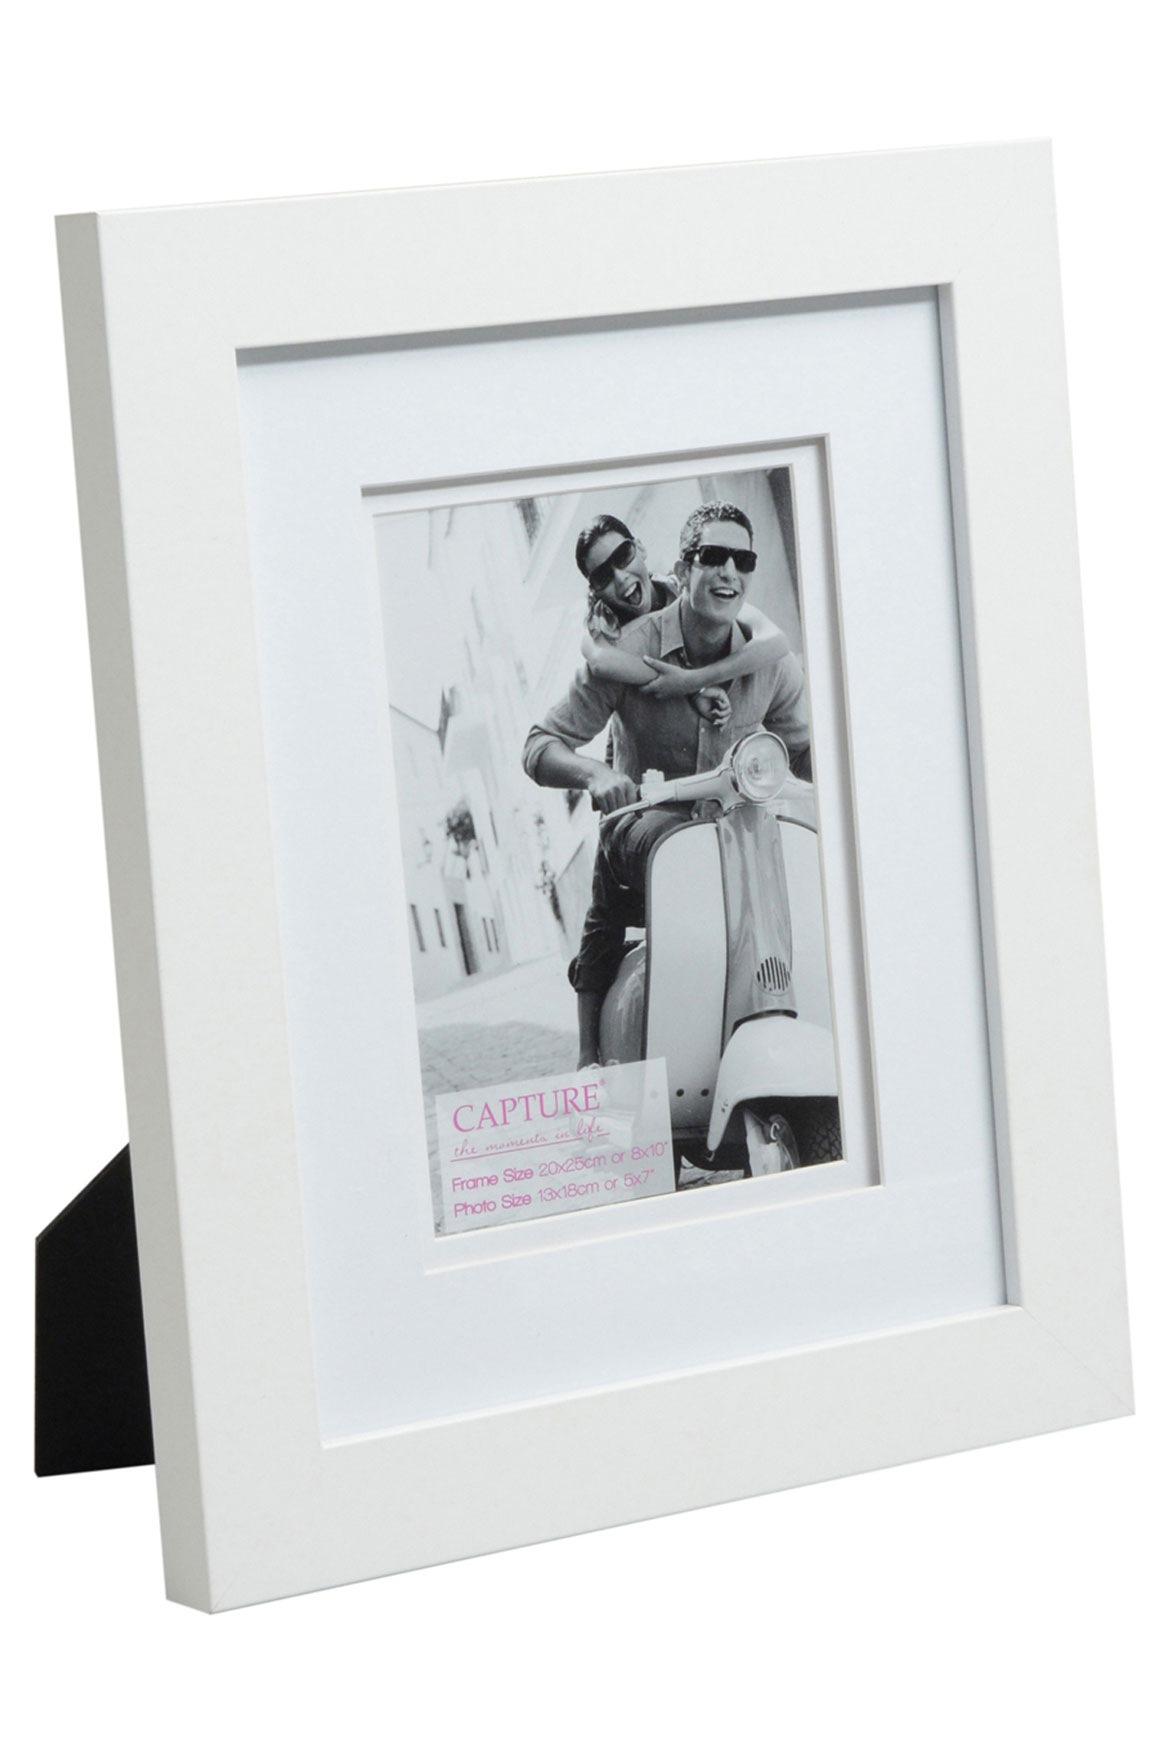 Picture Frames Myer - Frame Design & Reviews ✓